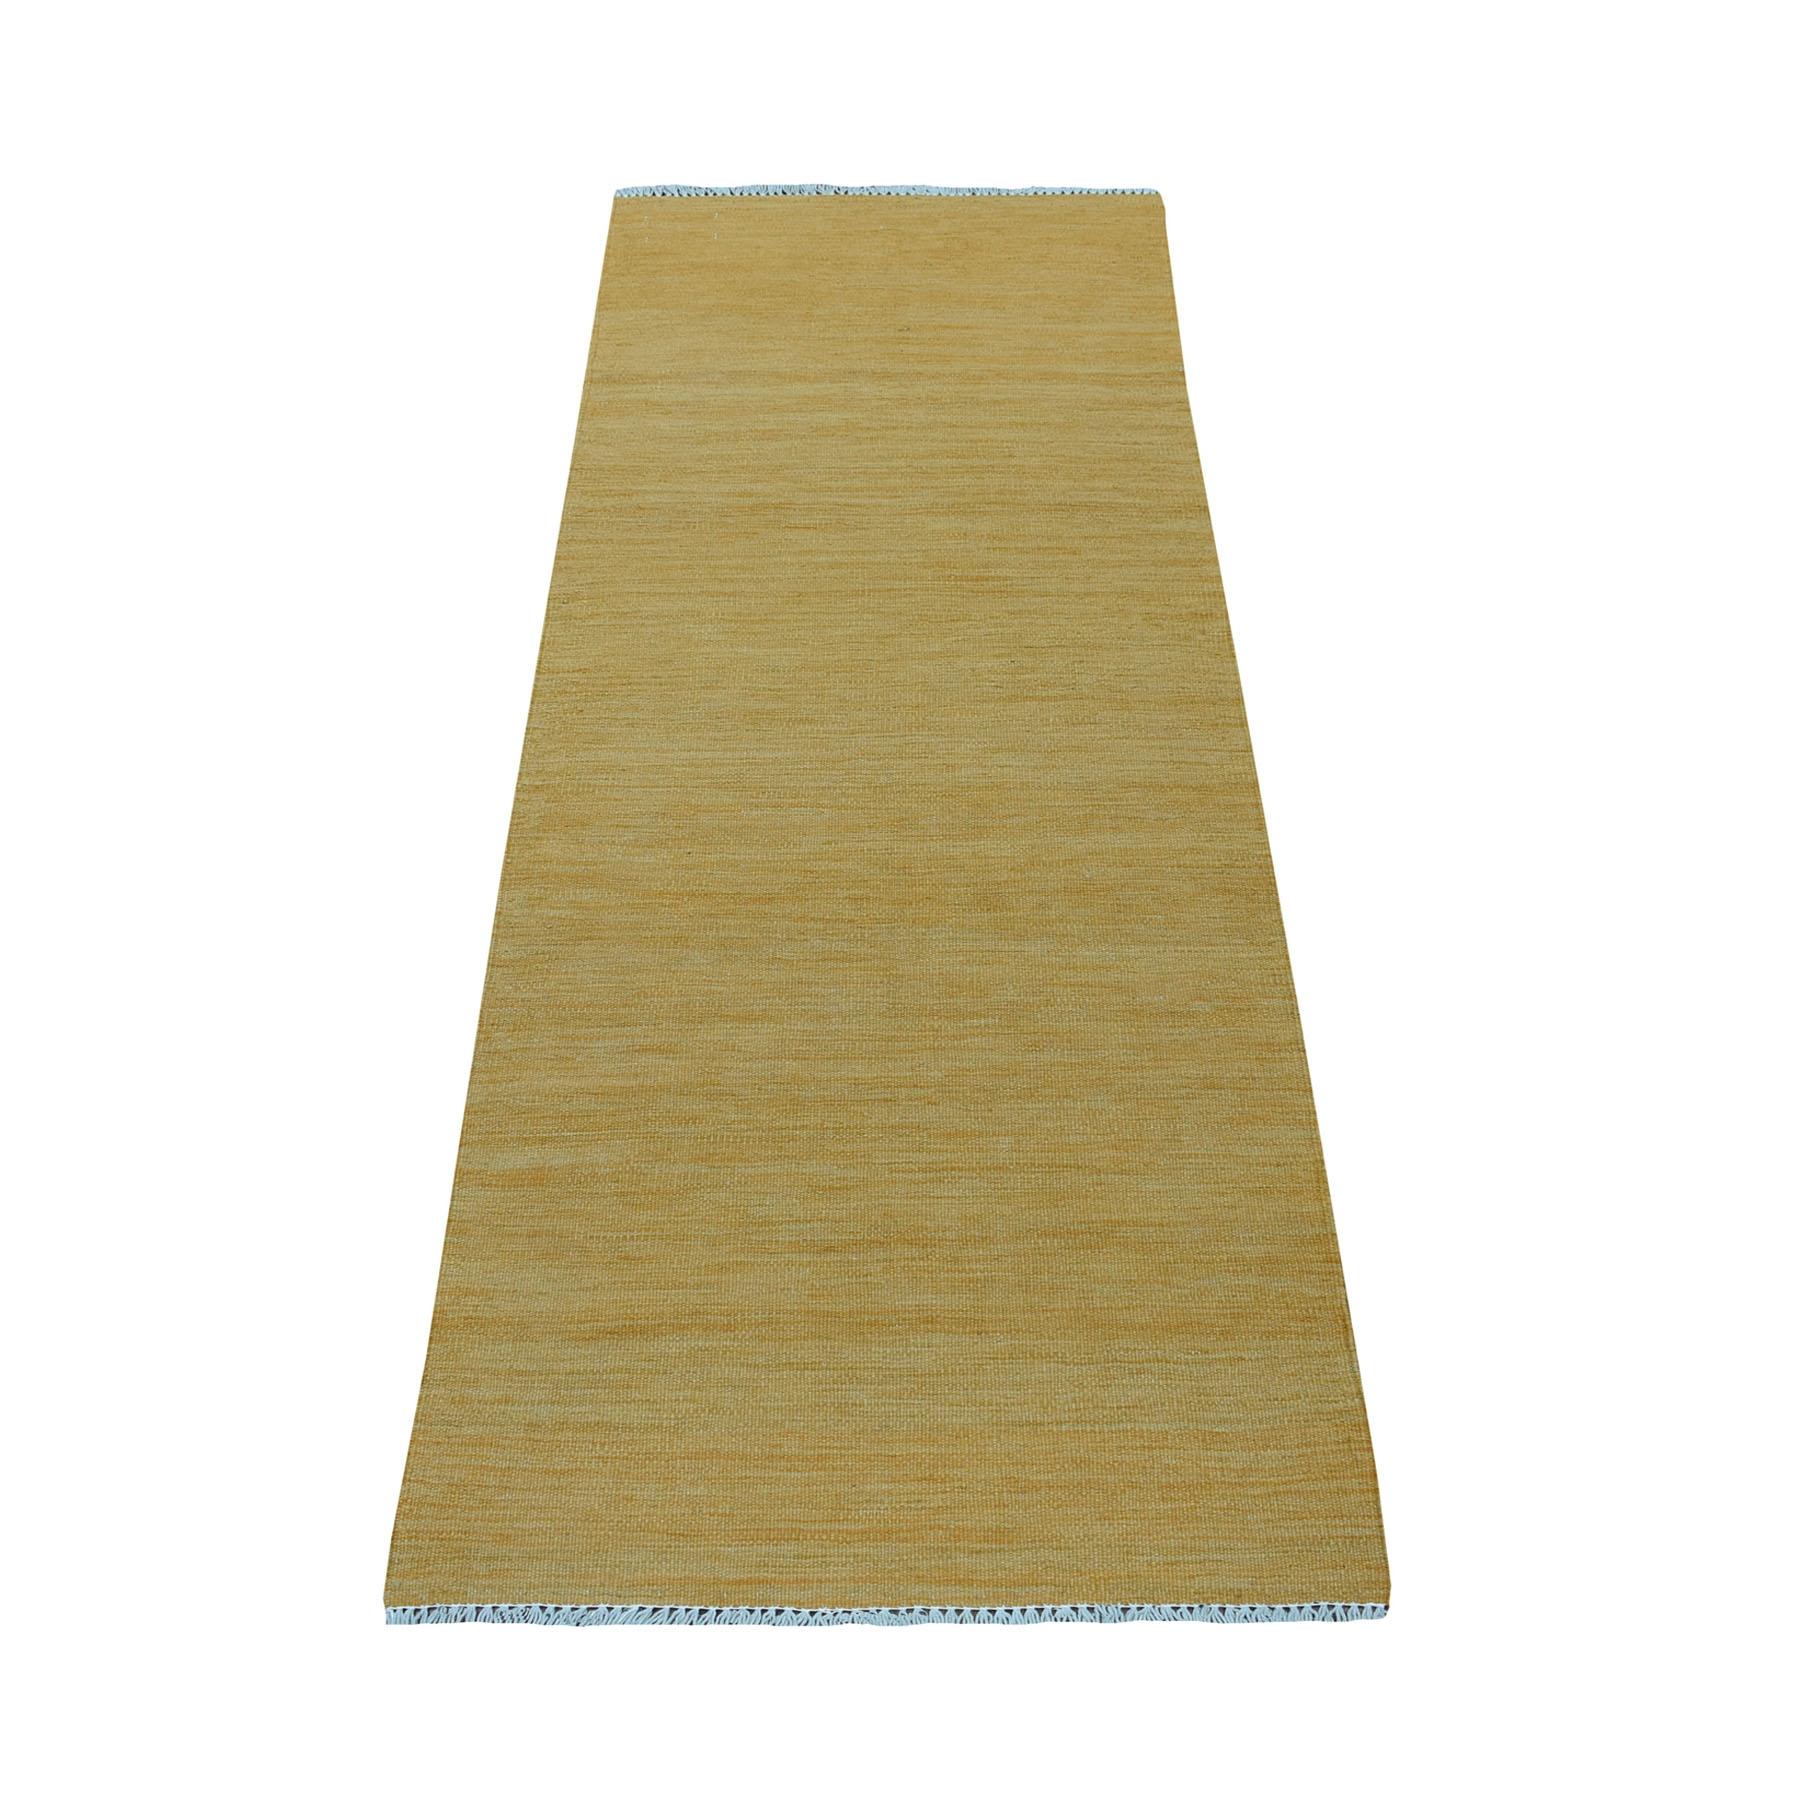 "2'3""x6'4"" Gold Shades Flat Weave Kilim Pure Wool Hand Woven Runner Oriental Rug"